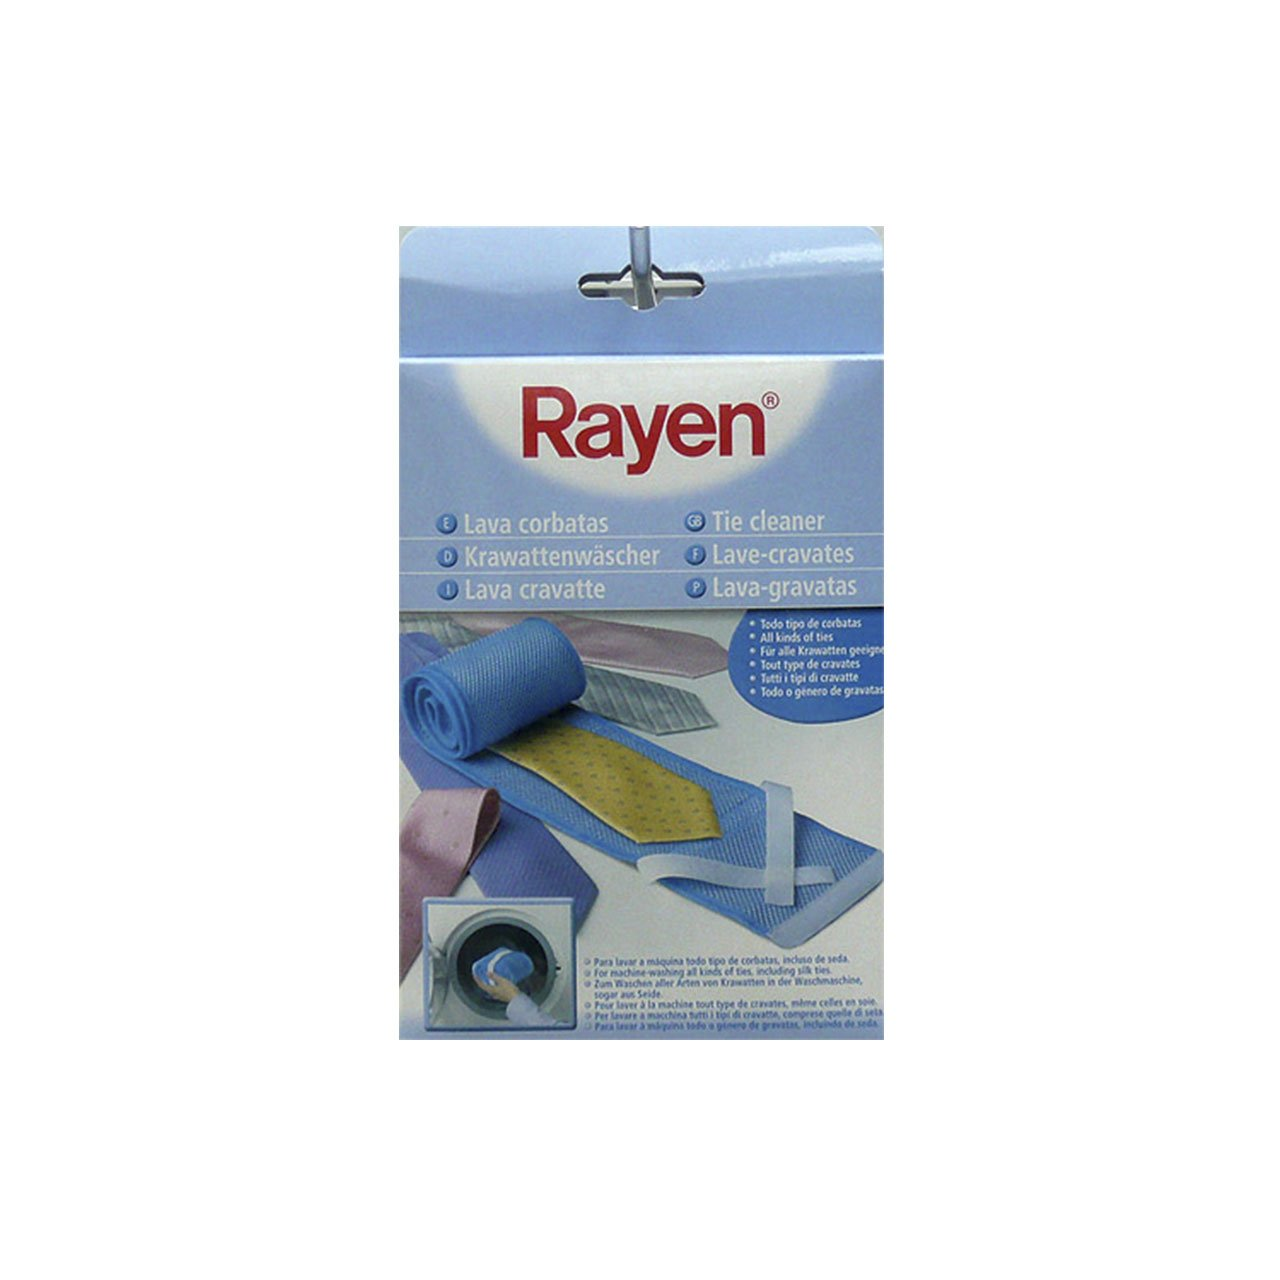 6d9066fb7b9b8 RAYEN 6388 Tie Cleaner